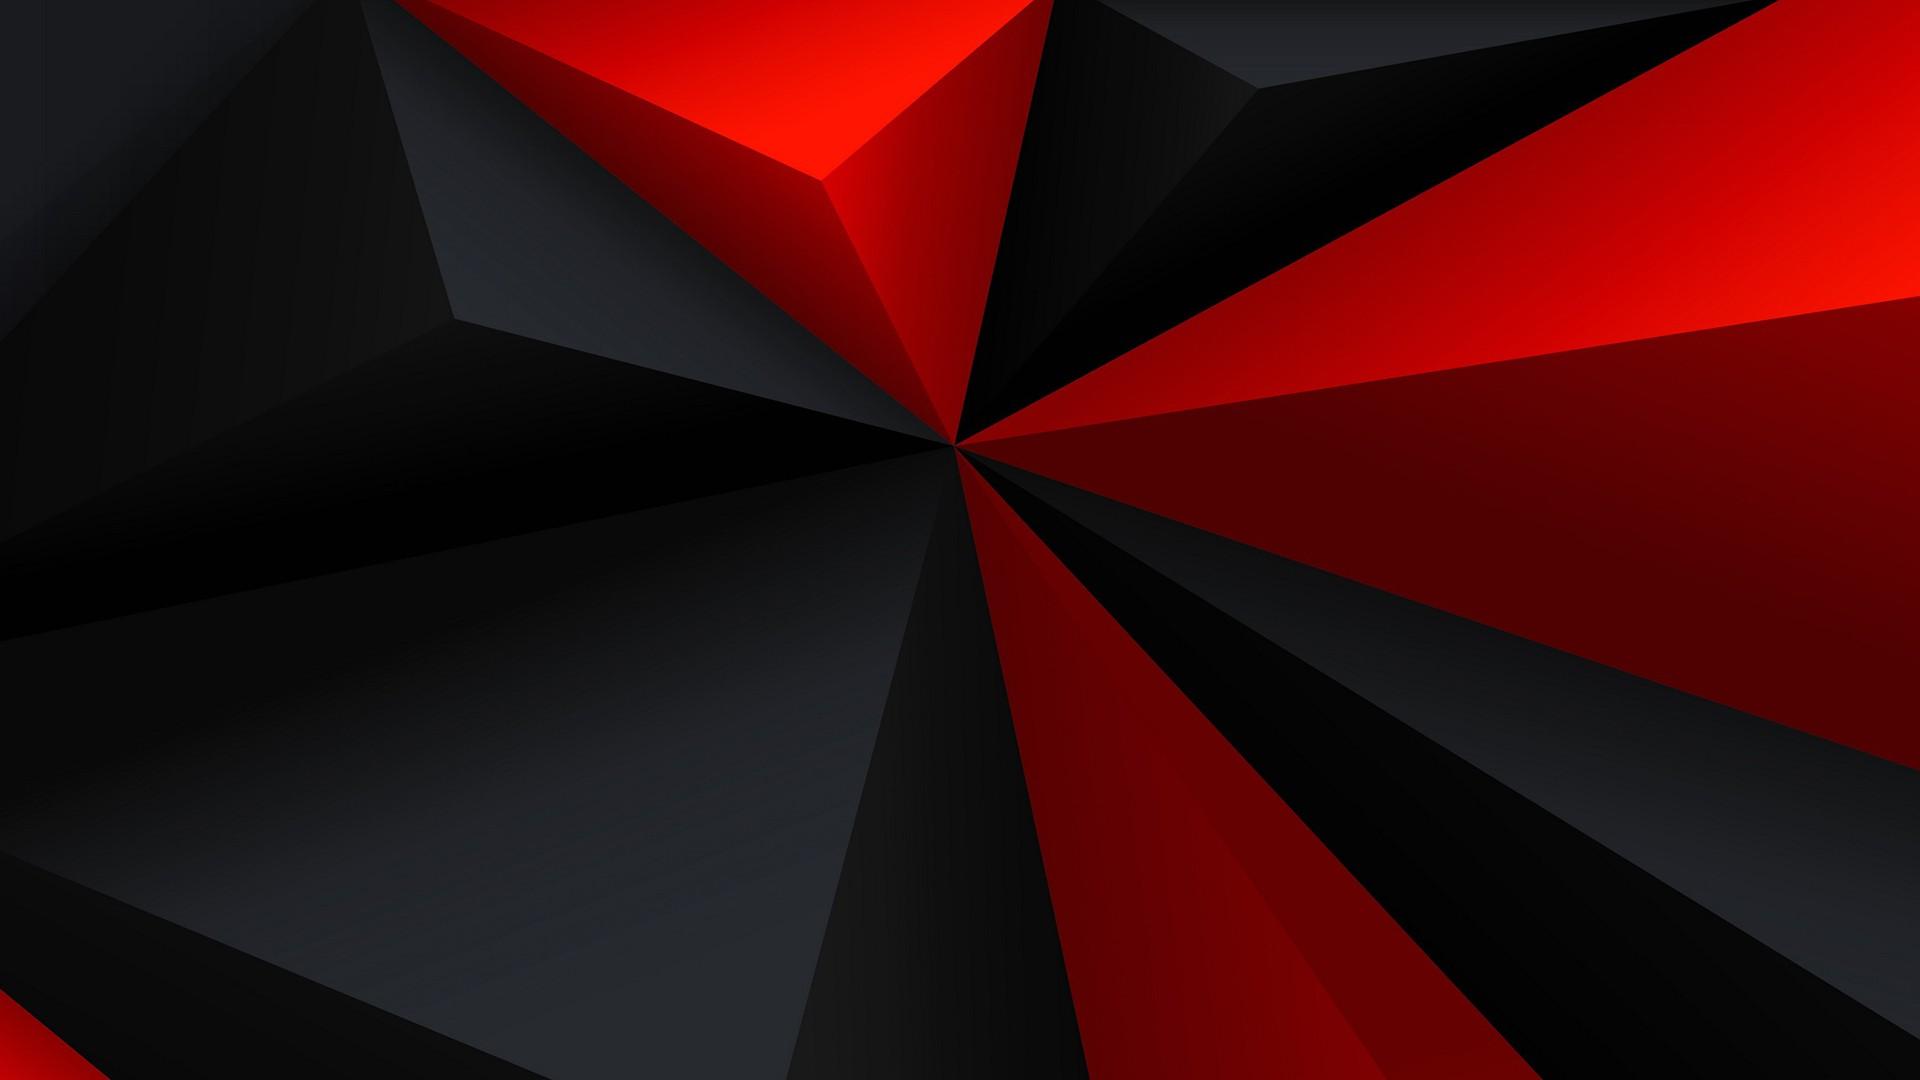 Black Red Wallpaper Designs Tosmun